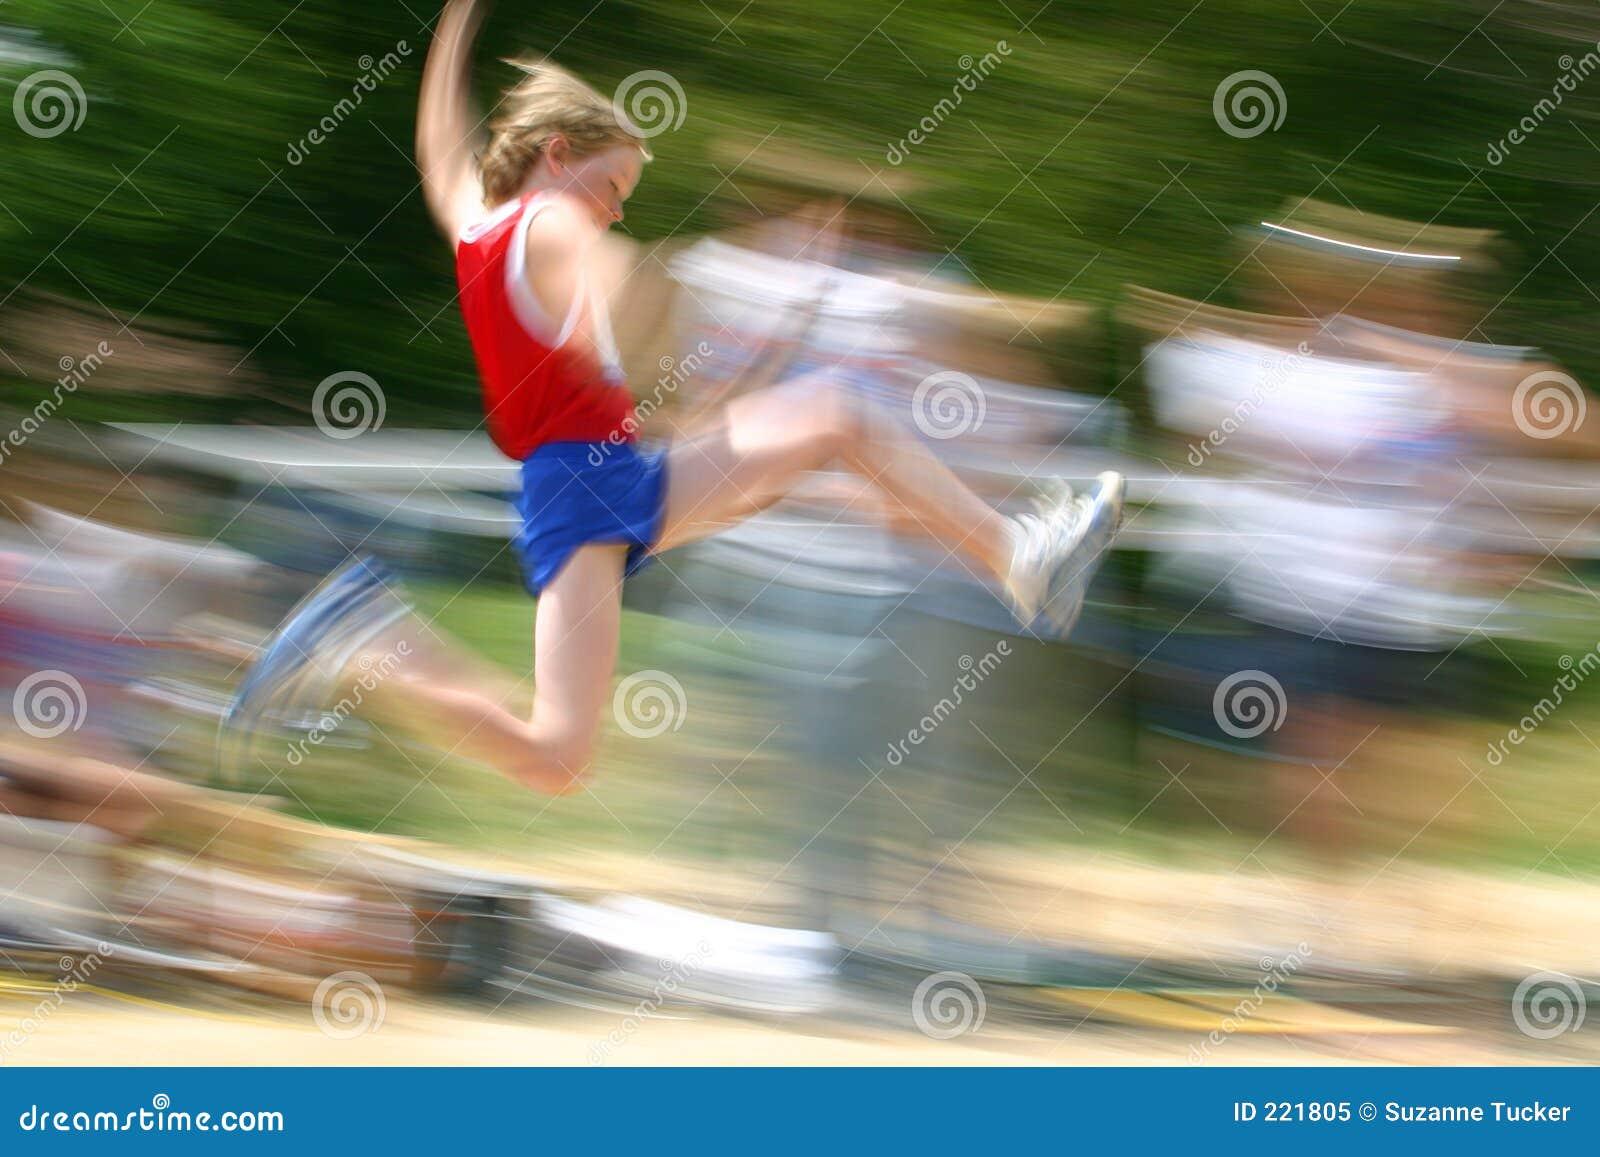 Boy jumping at track meet /motion blur